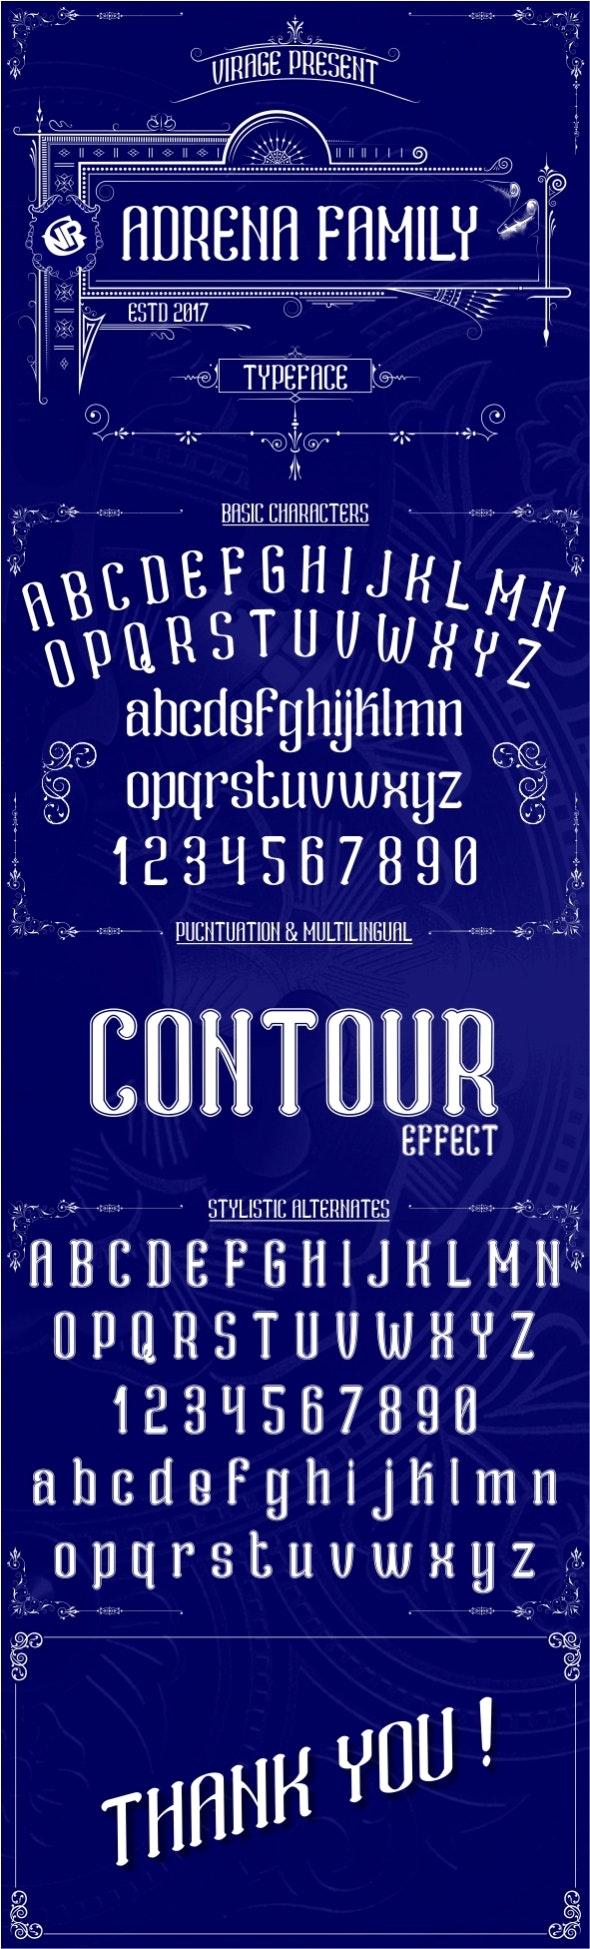 Adrena family - Decorative Fonts